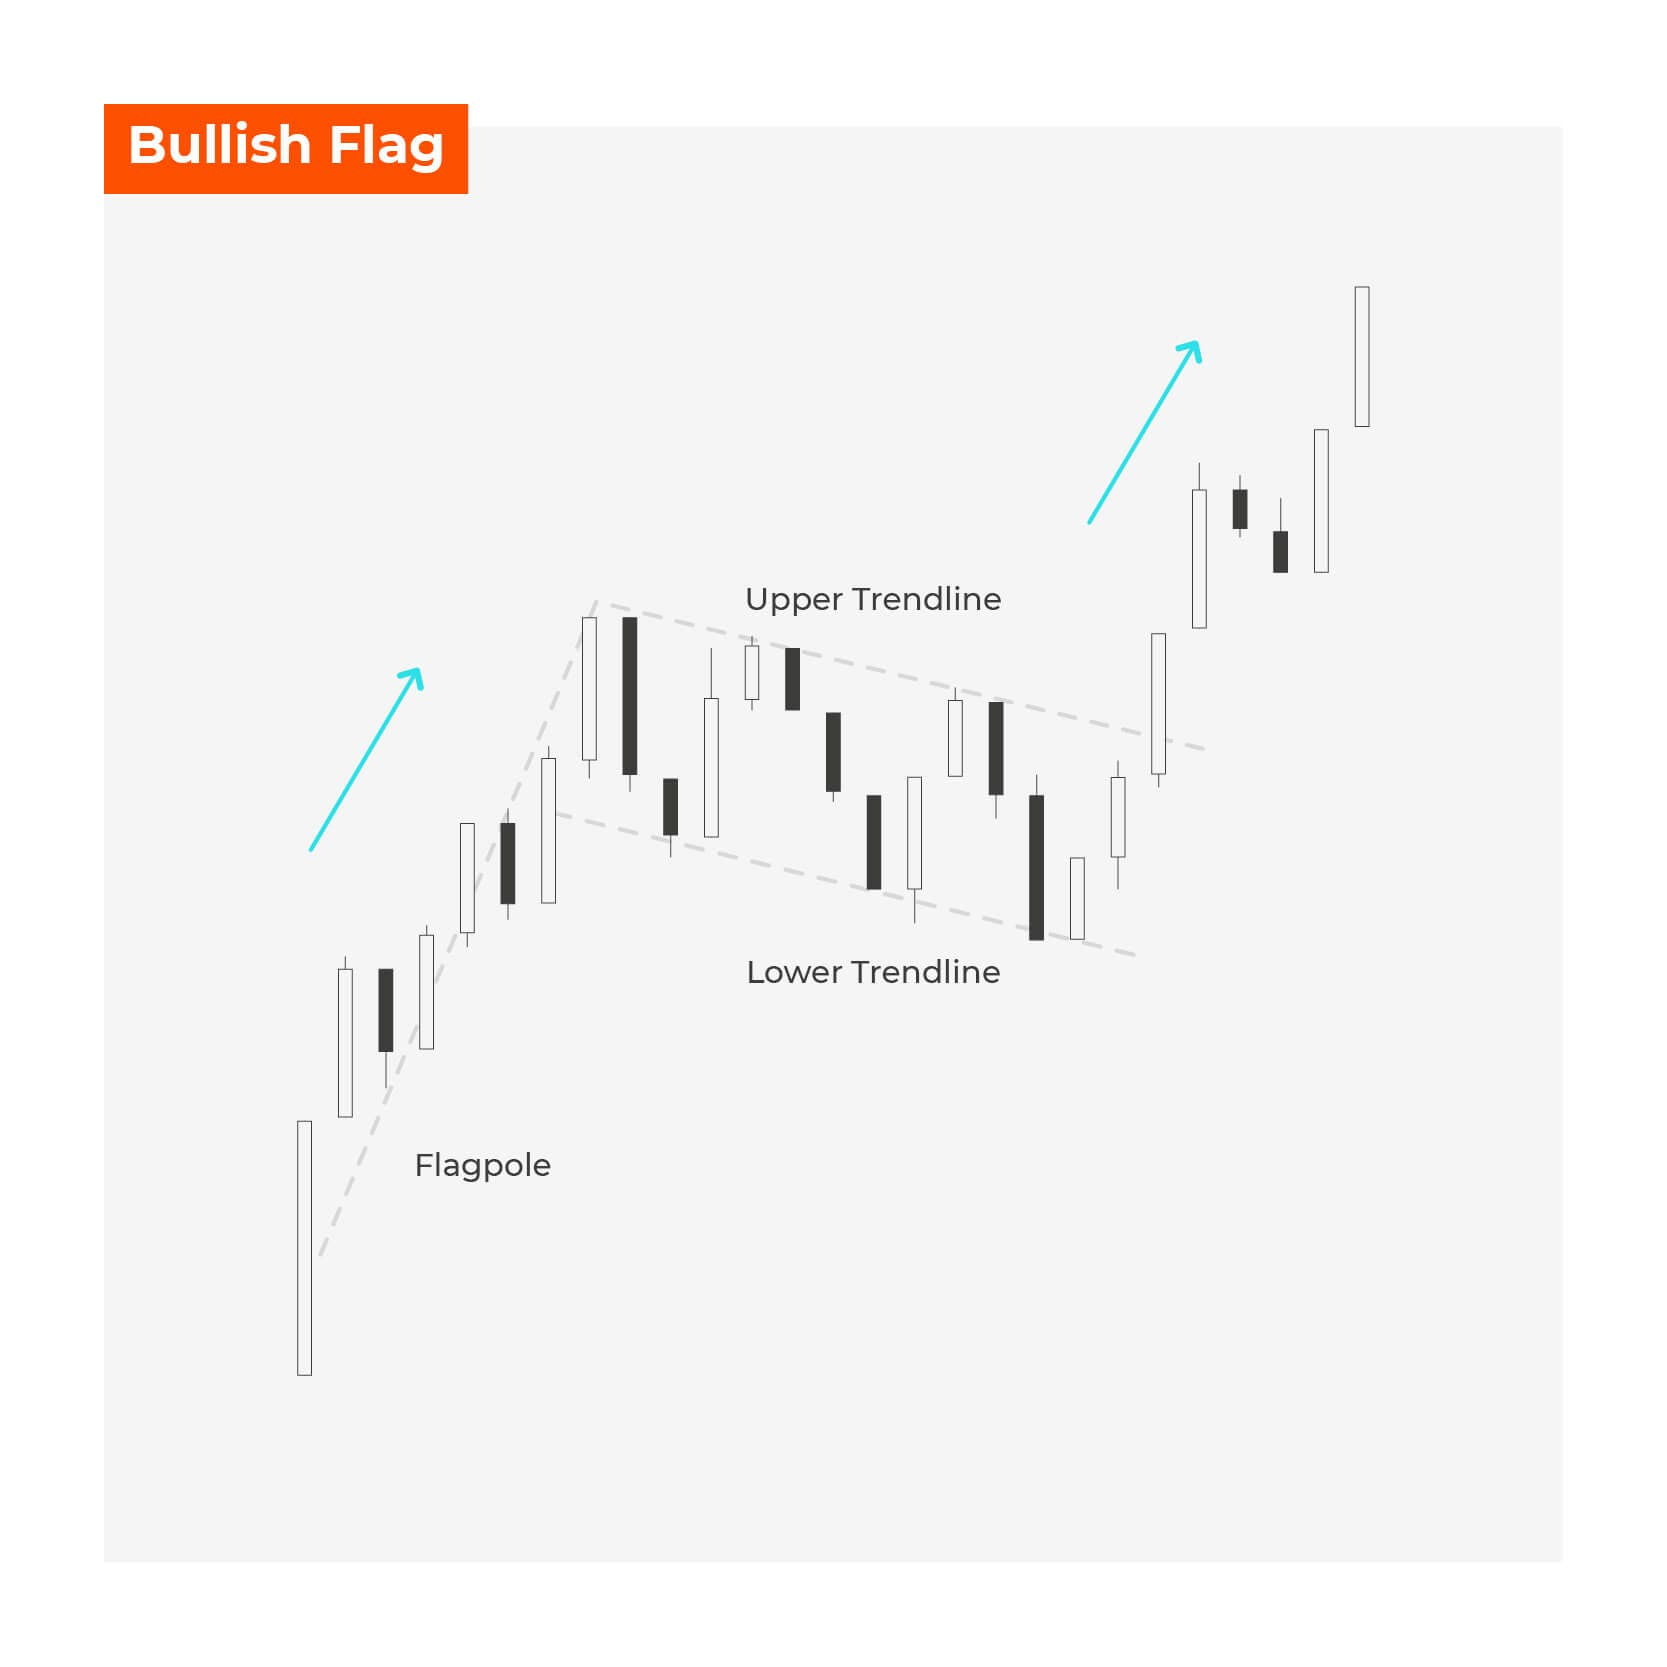 Bullish Flag